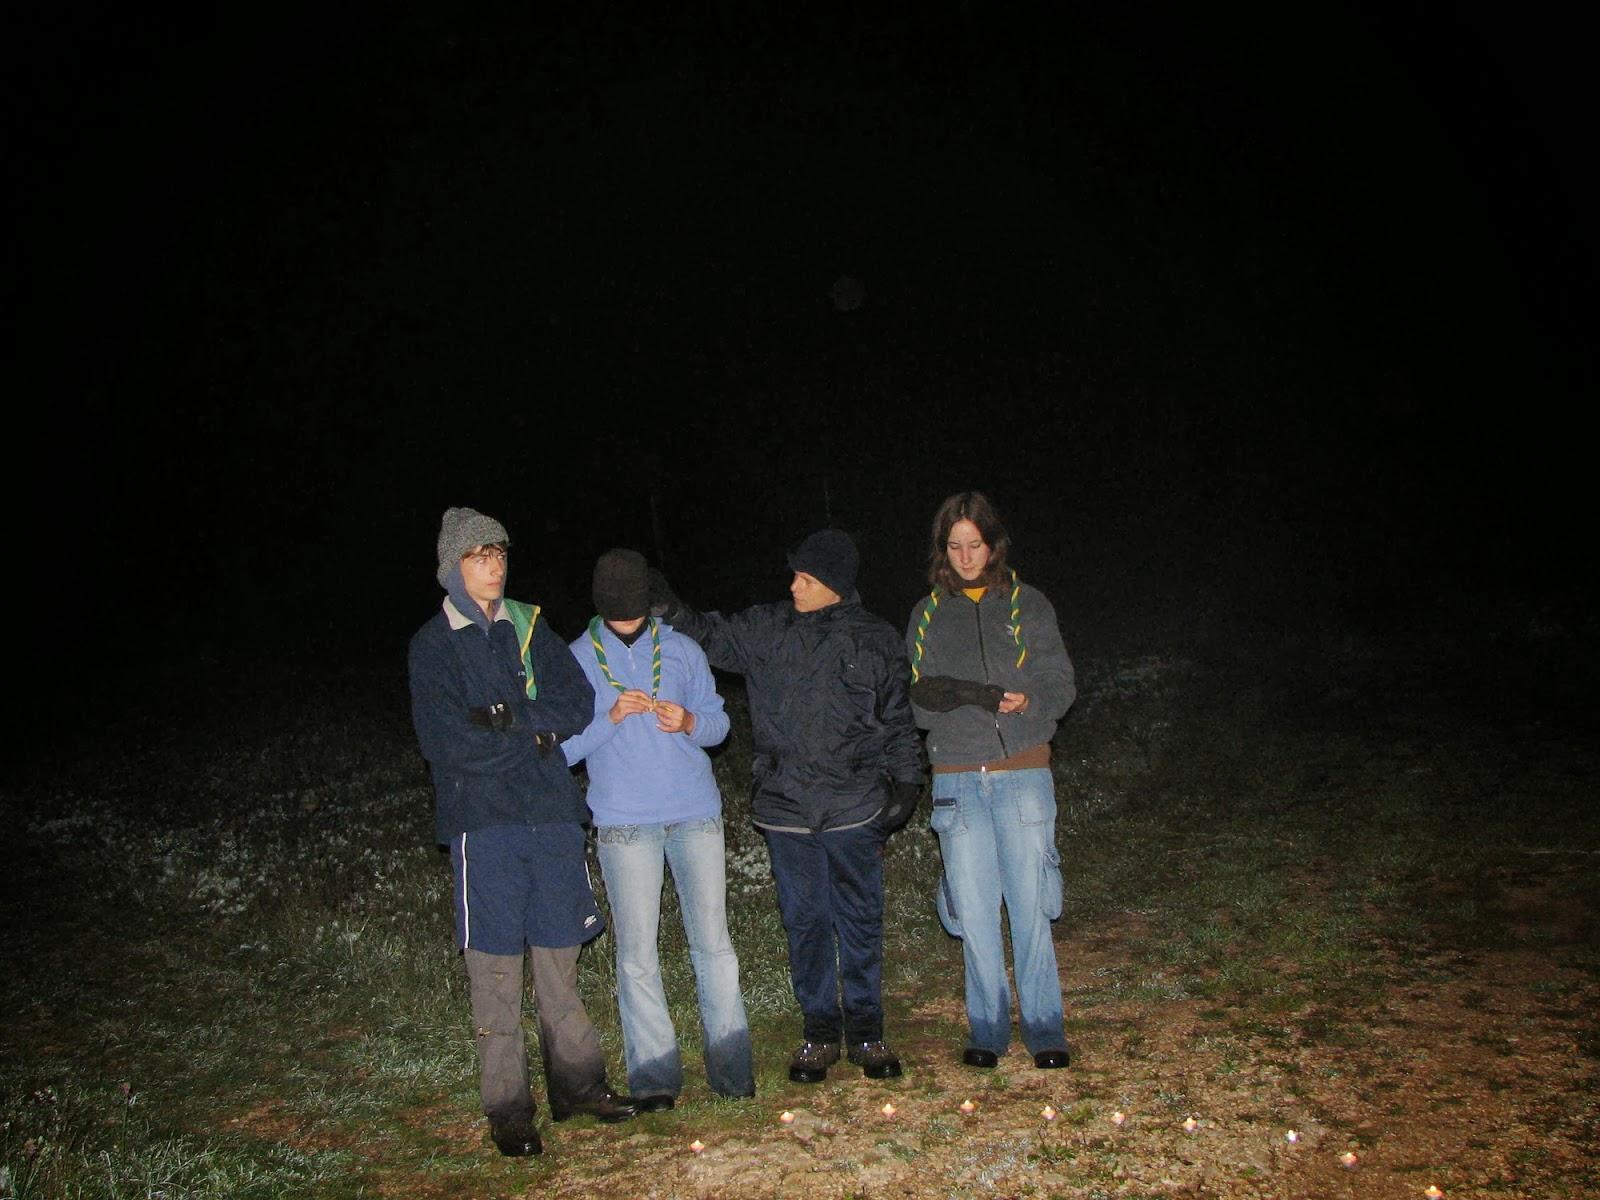 Prehod PP, Ilirska Bistrica 2005 - picture%2B071.jpg